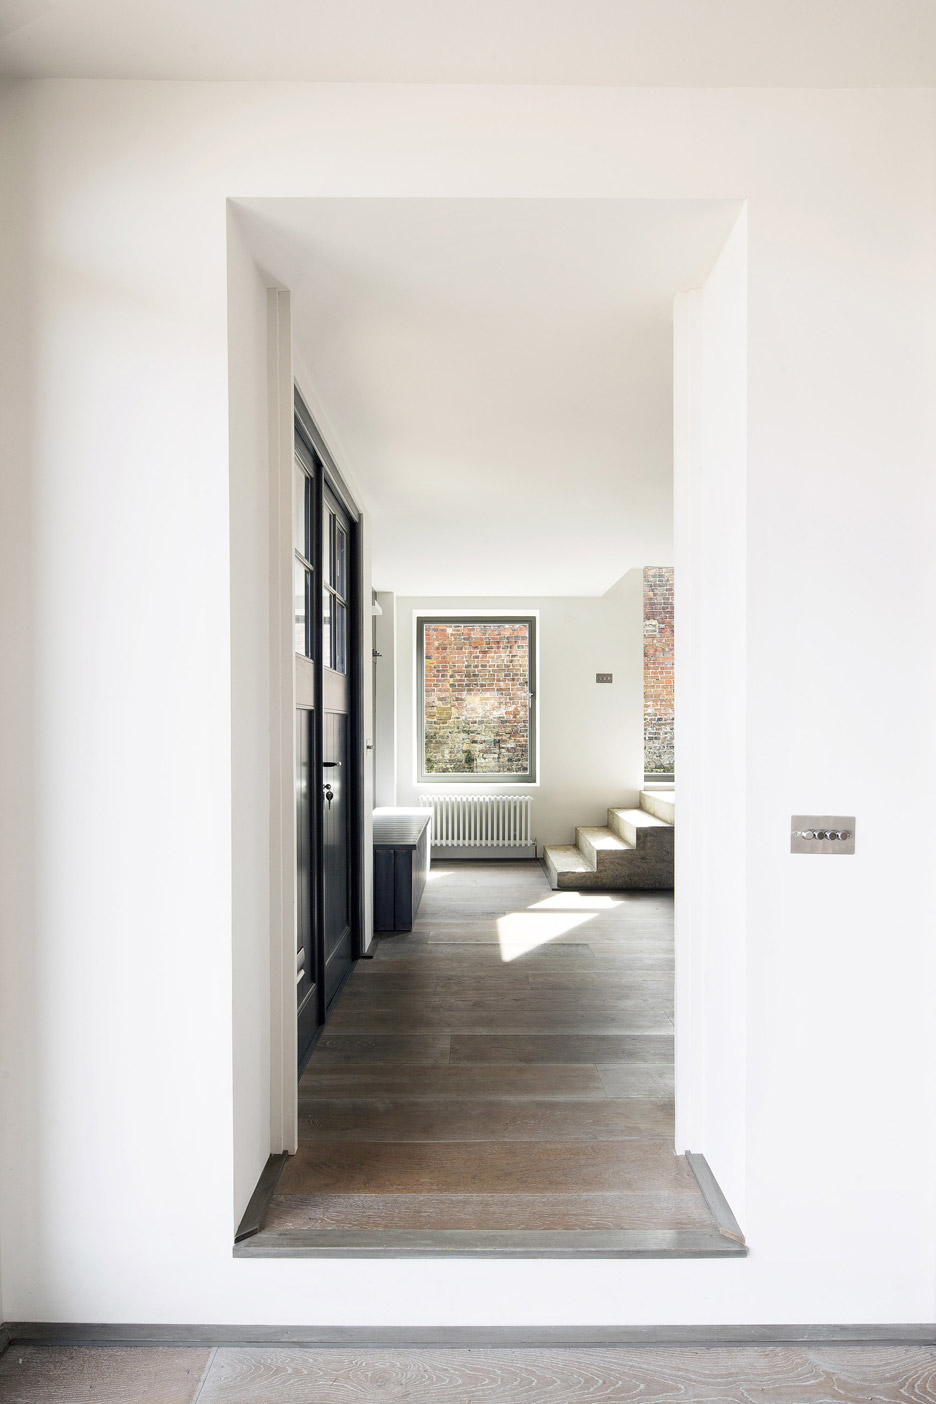 architecture_ambulance_house__design_studia_interiors_osnovadesign_osnova_poltava_14